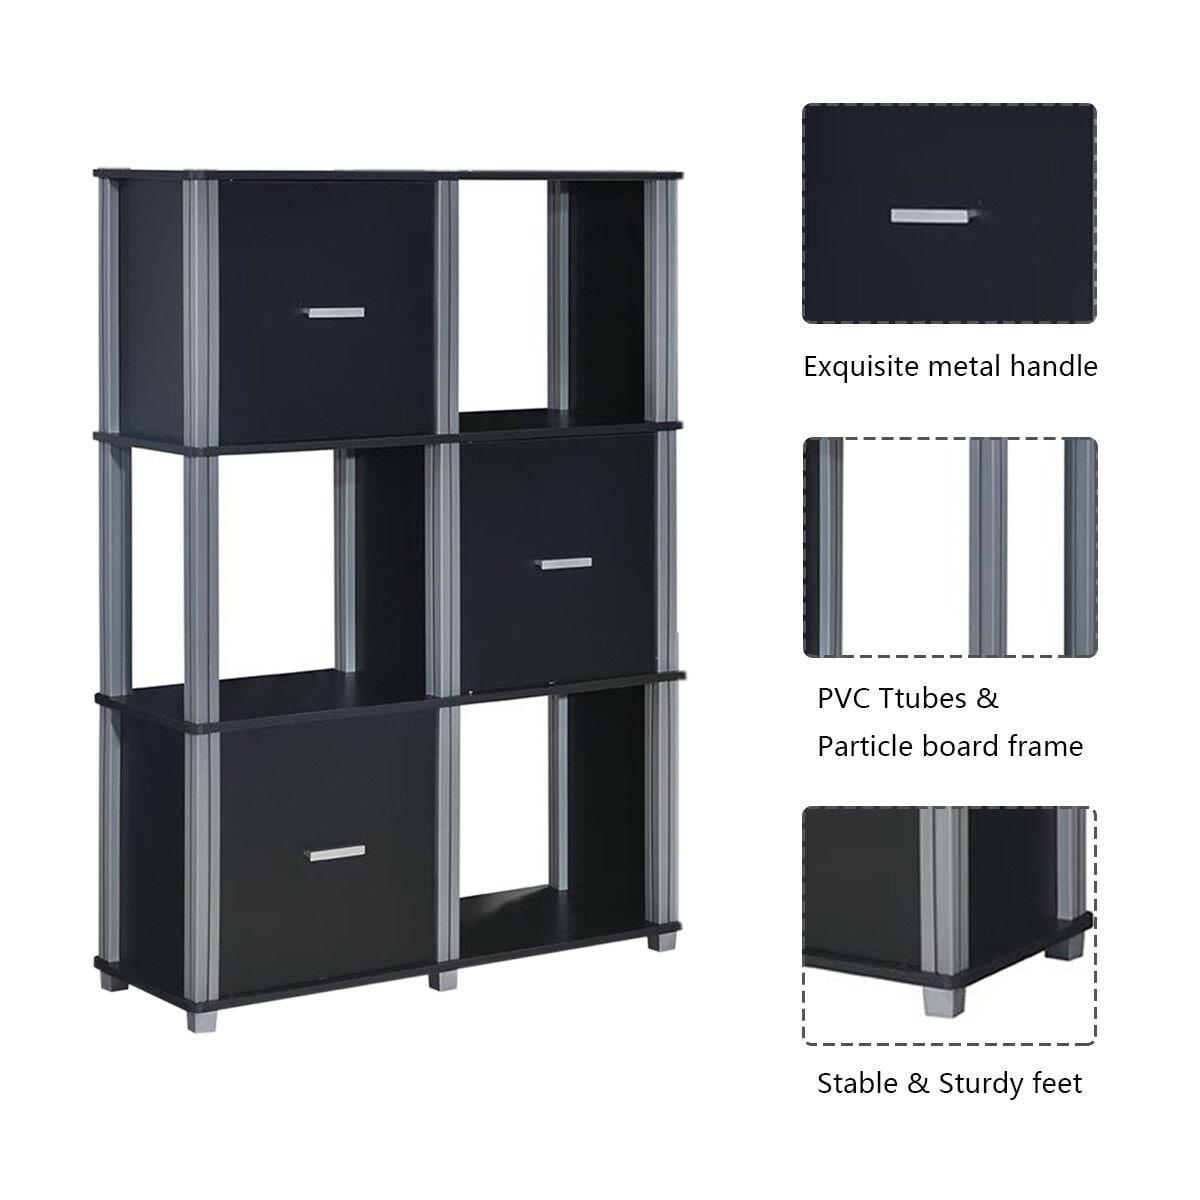 346e3935bab9 Costway 3 Tier Bookcase 6 Cubes Storage Cabinet Shelf Organizer Unit  Display Black